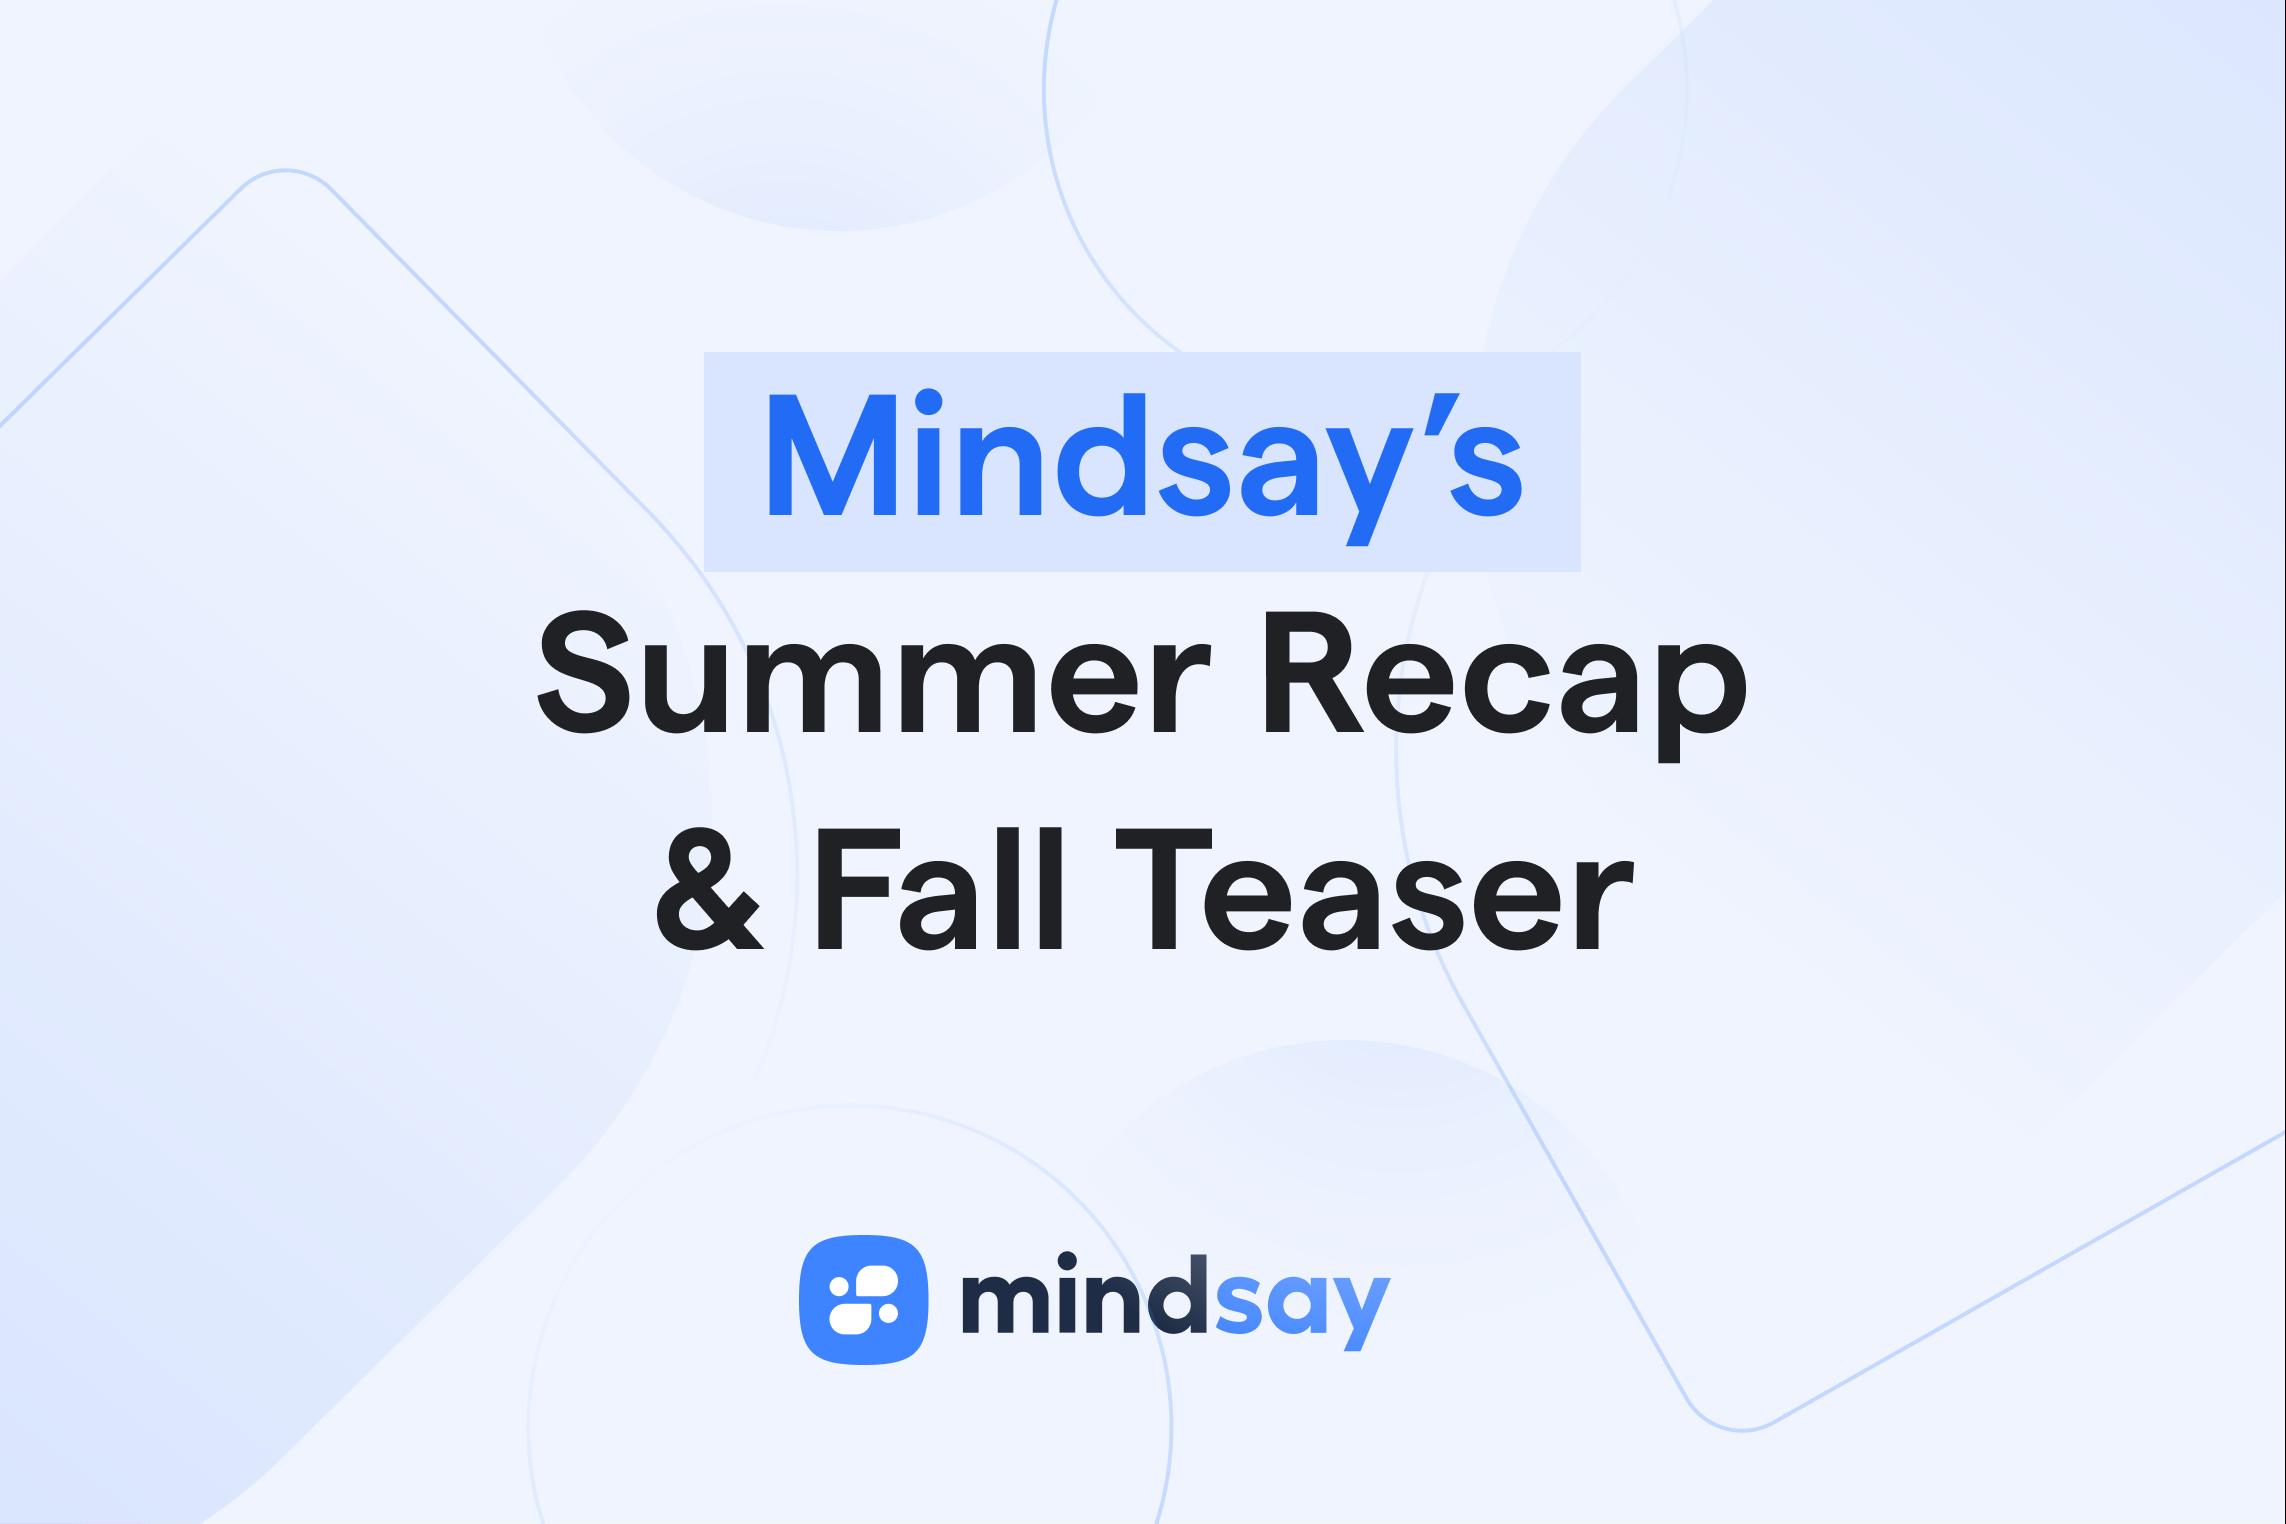 Mindsay's Summer Recap and Fall Teaser